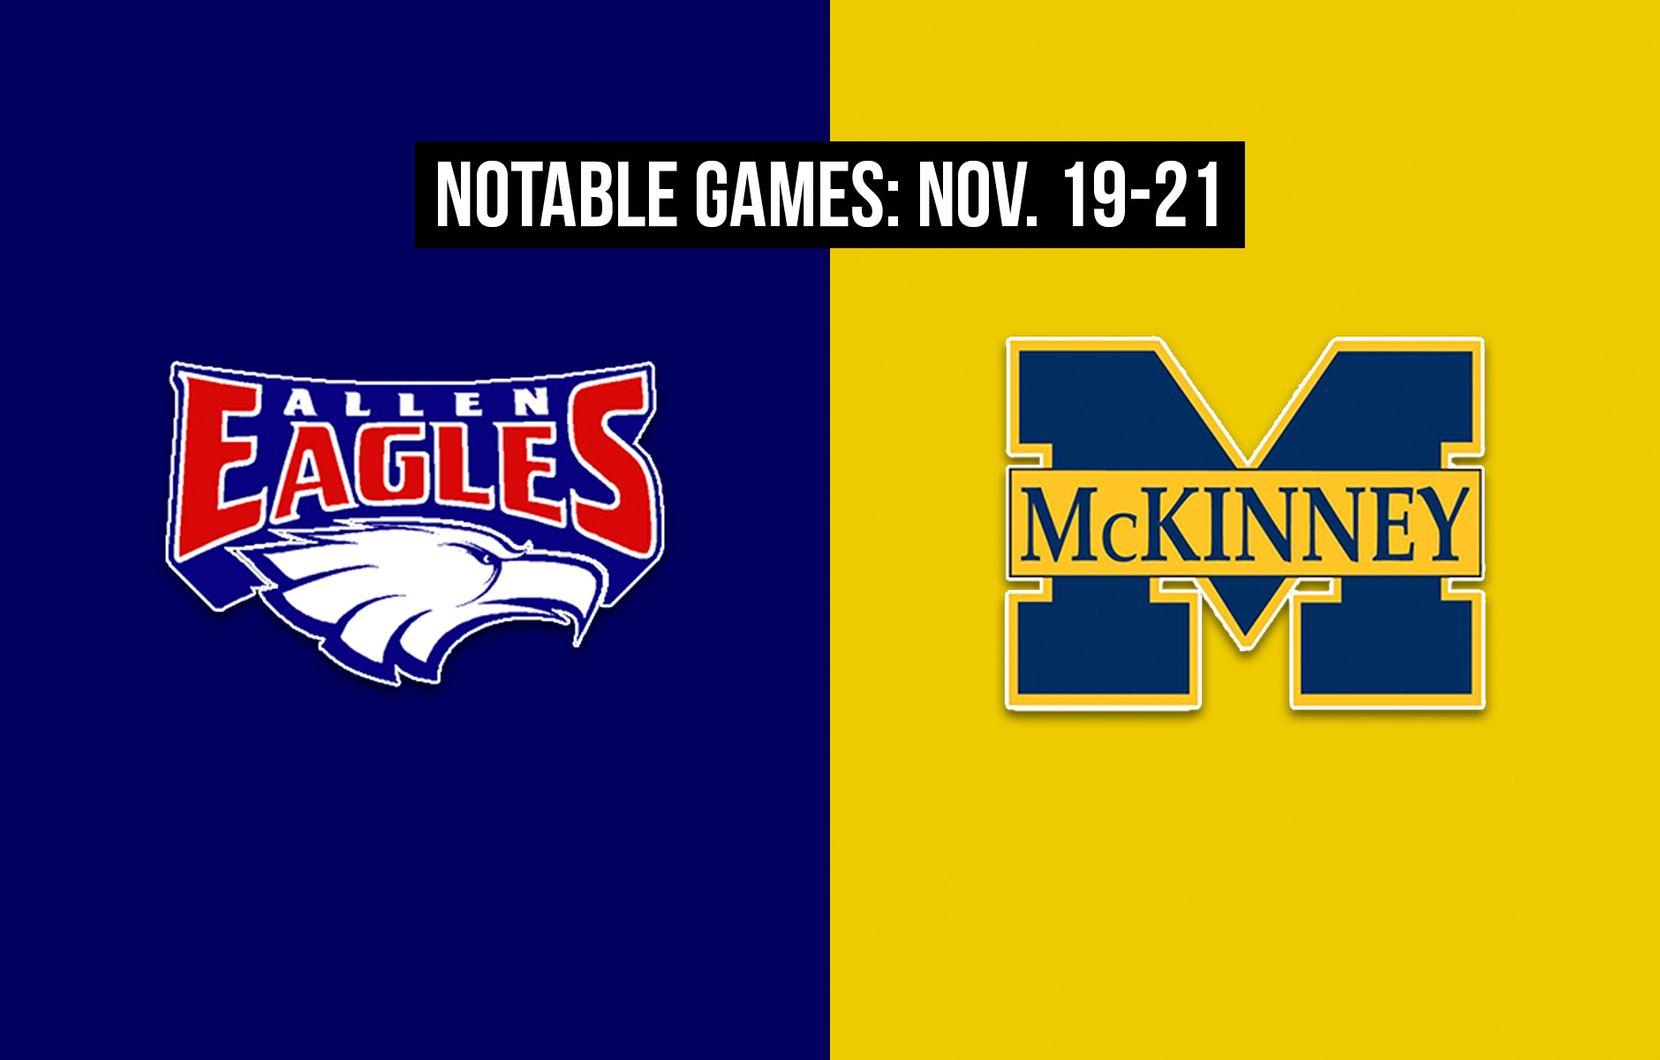 Notable games for the week of Nov. 19-21 of the 2020 season: Allen vs. McKinney.